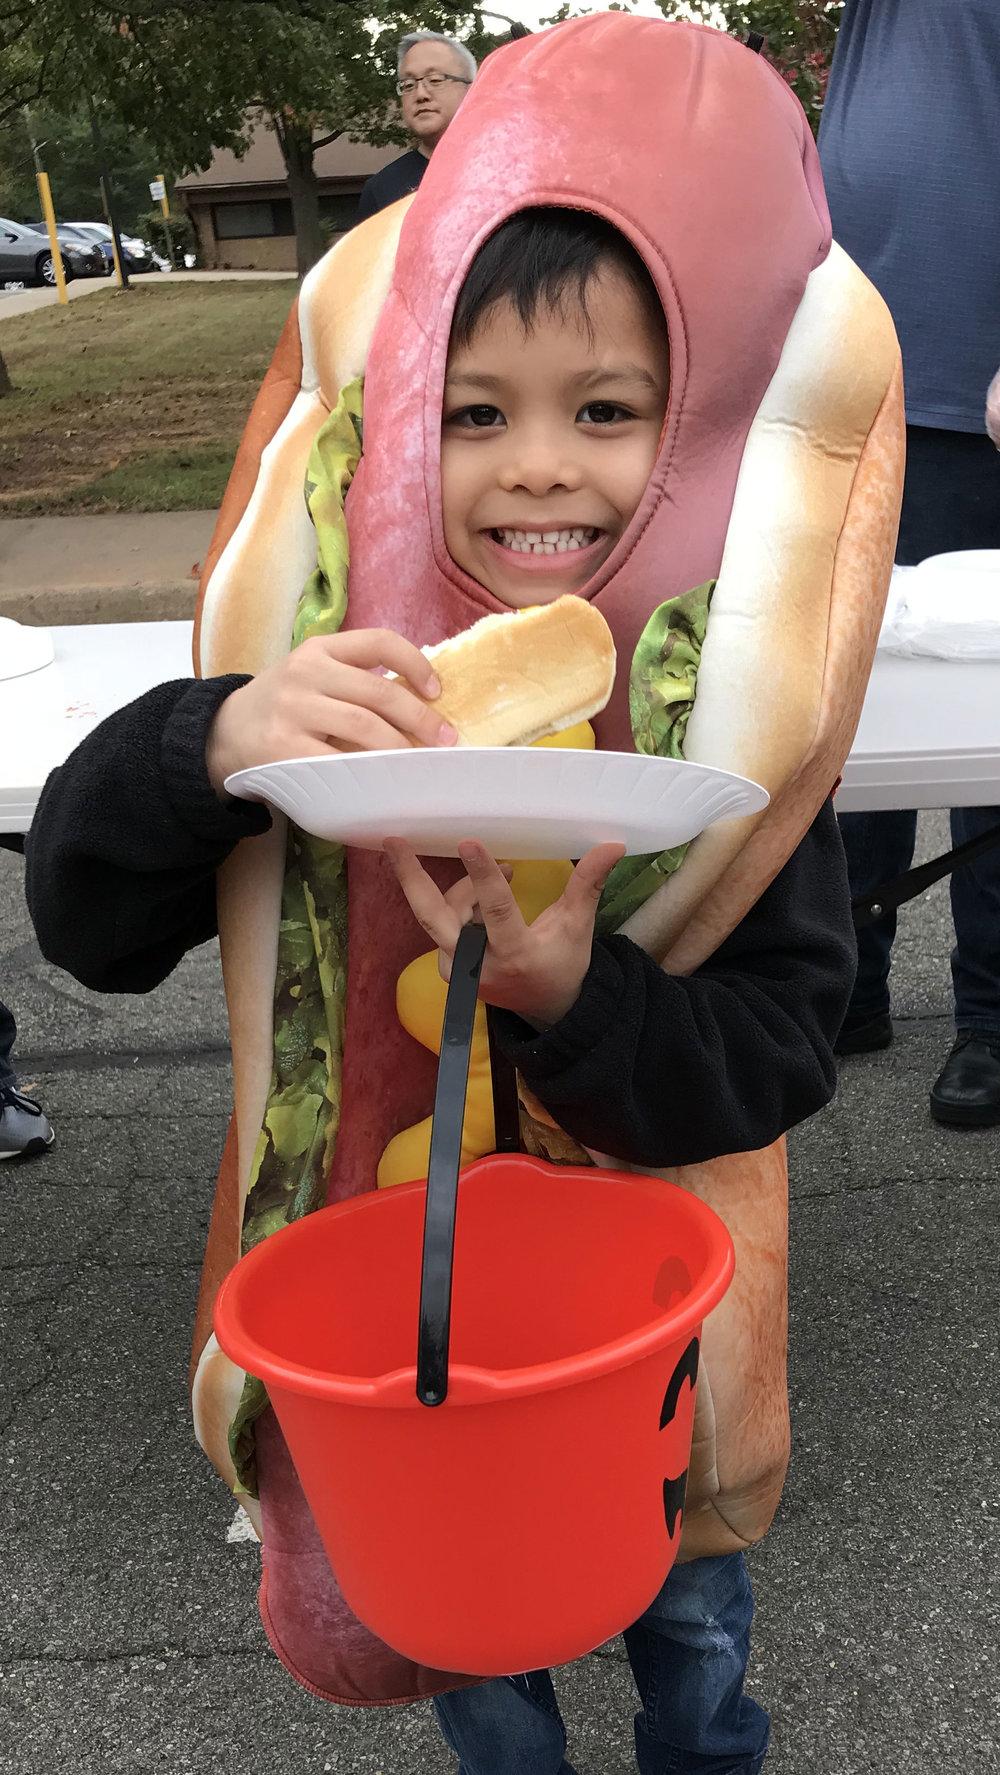 Hotdog-kid.jpg